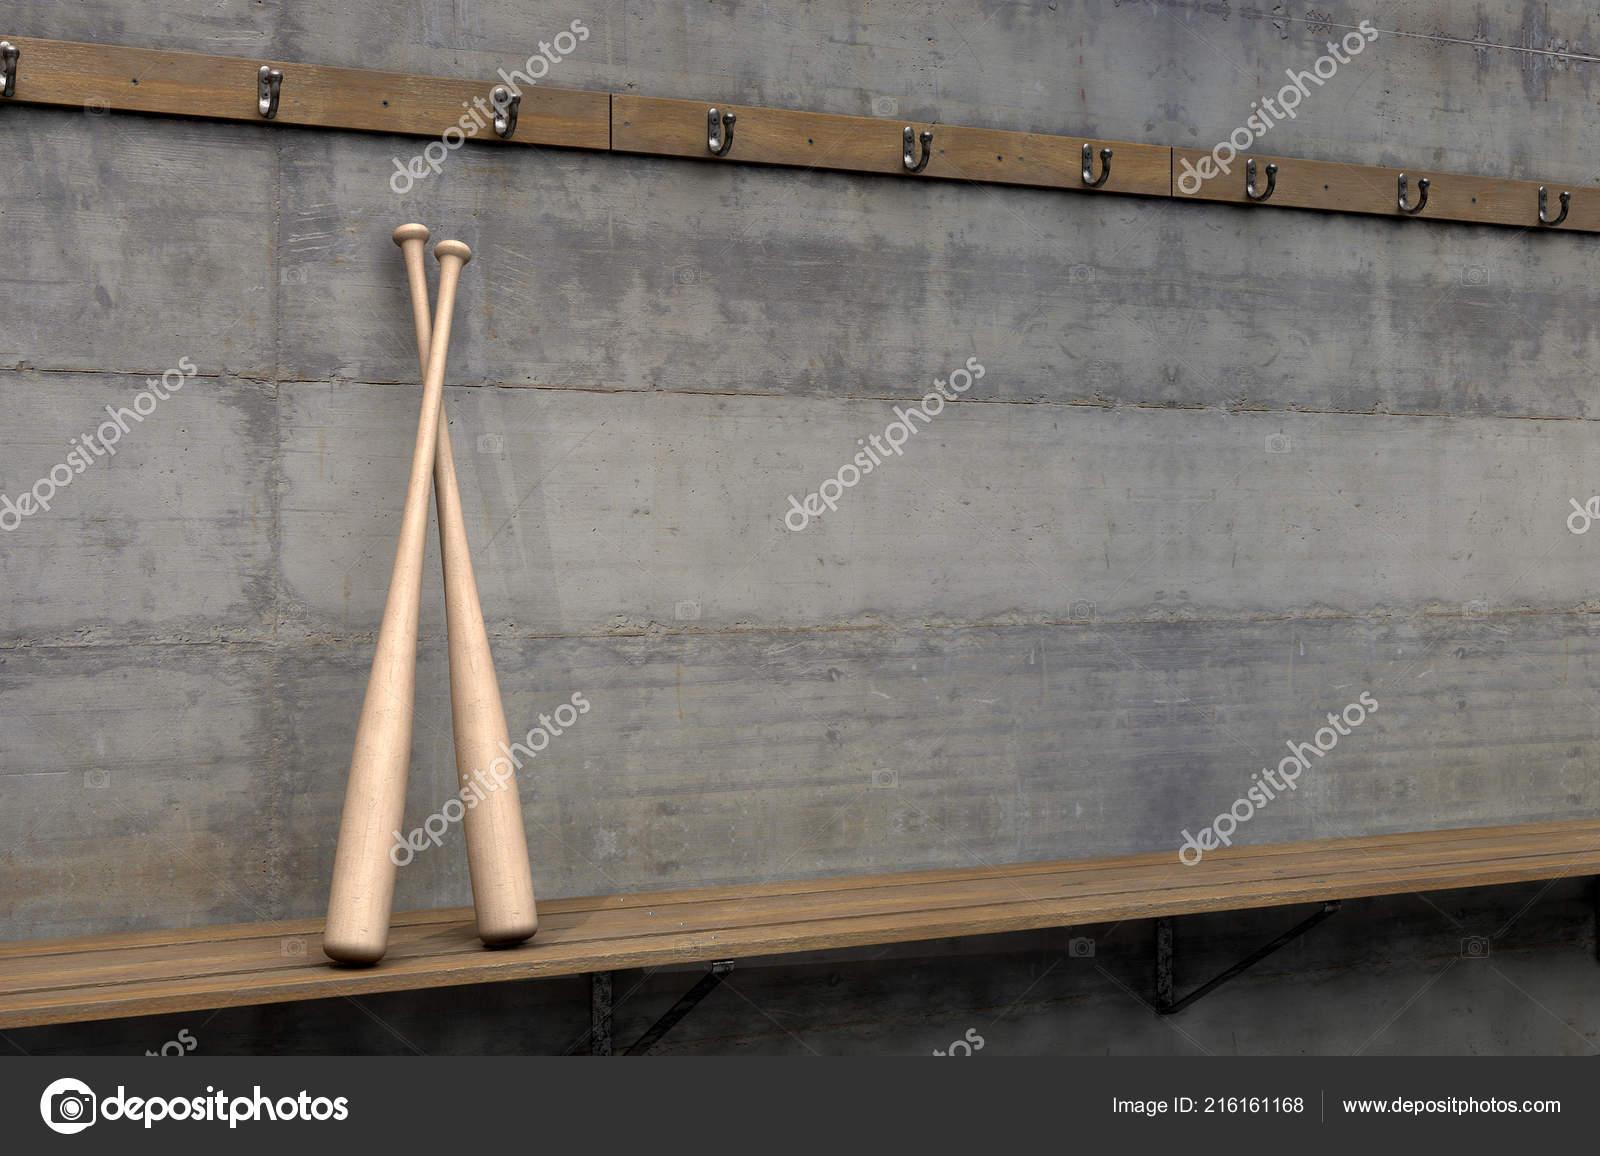 Marvelous Two Baseball Bats Wooden Bench Rundown Sports Locker Change Beatyapartments Chair Design Images Beatyapartmentscom